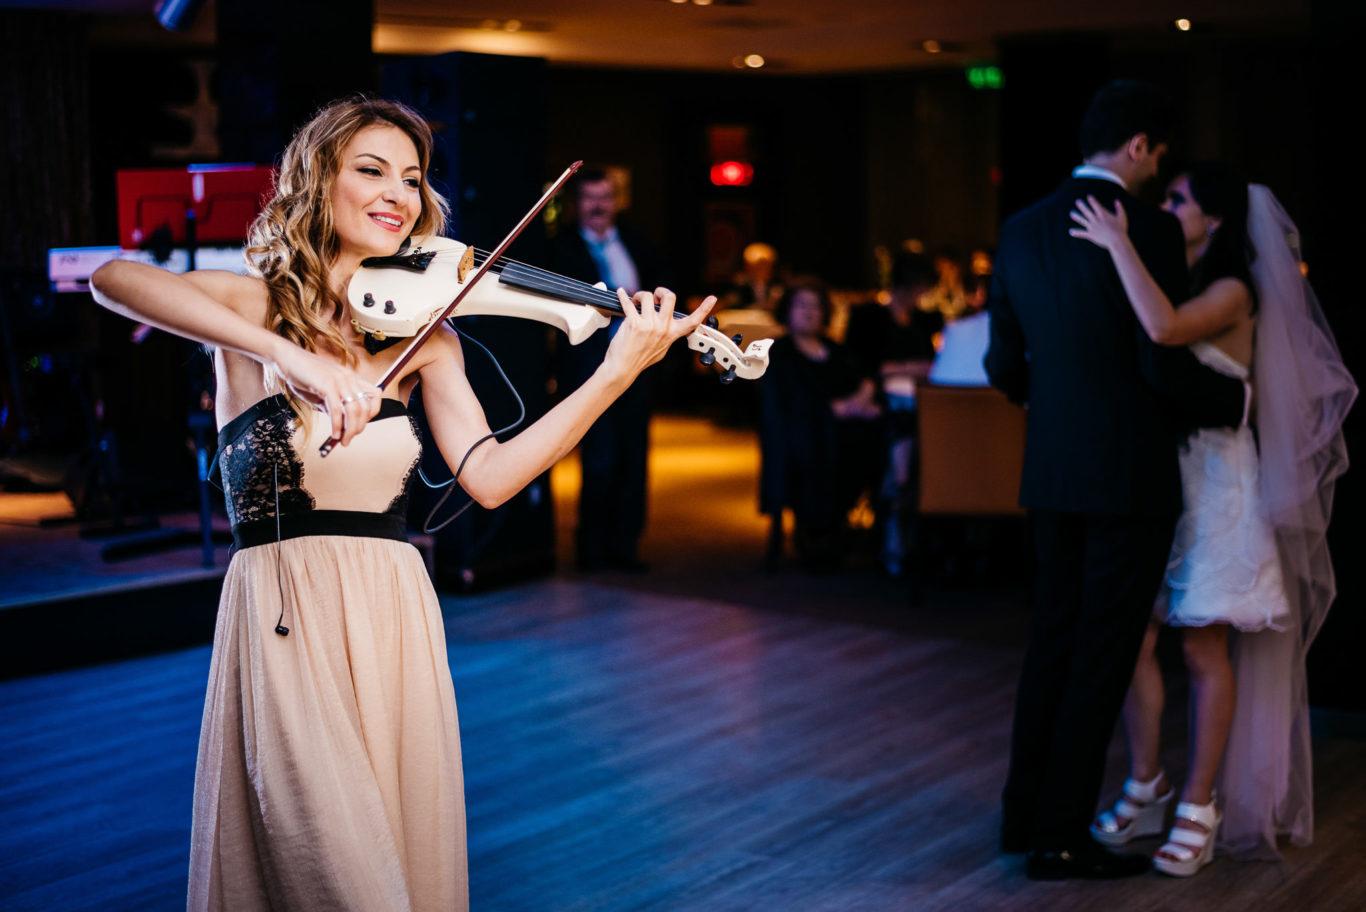 0989-Fotografie-nunta-Simona-Valentin-fotograf-Ciprian-Dumitrescu-DSC_2964